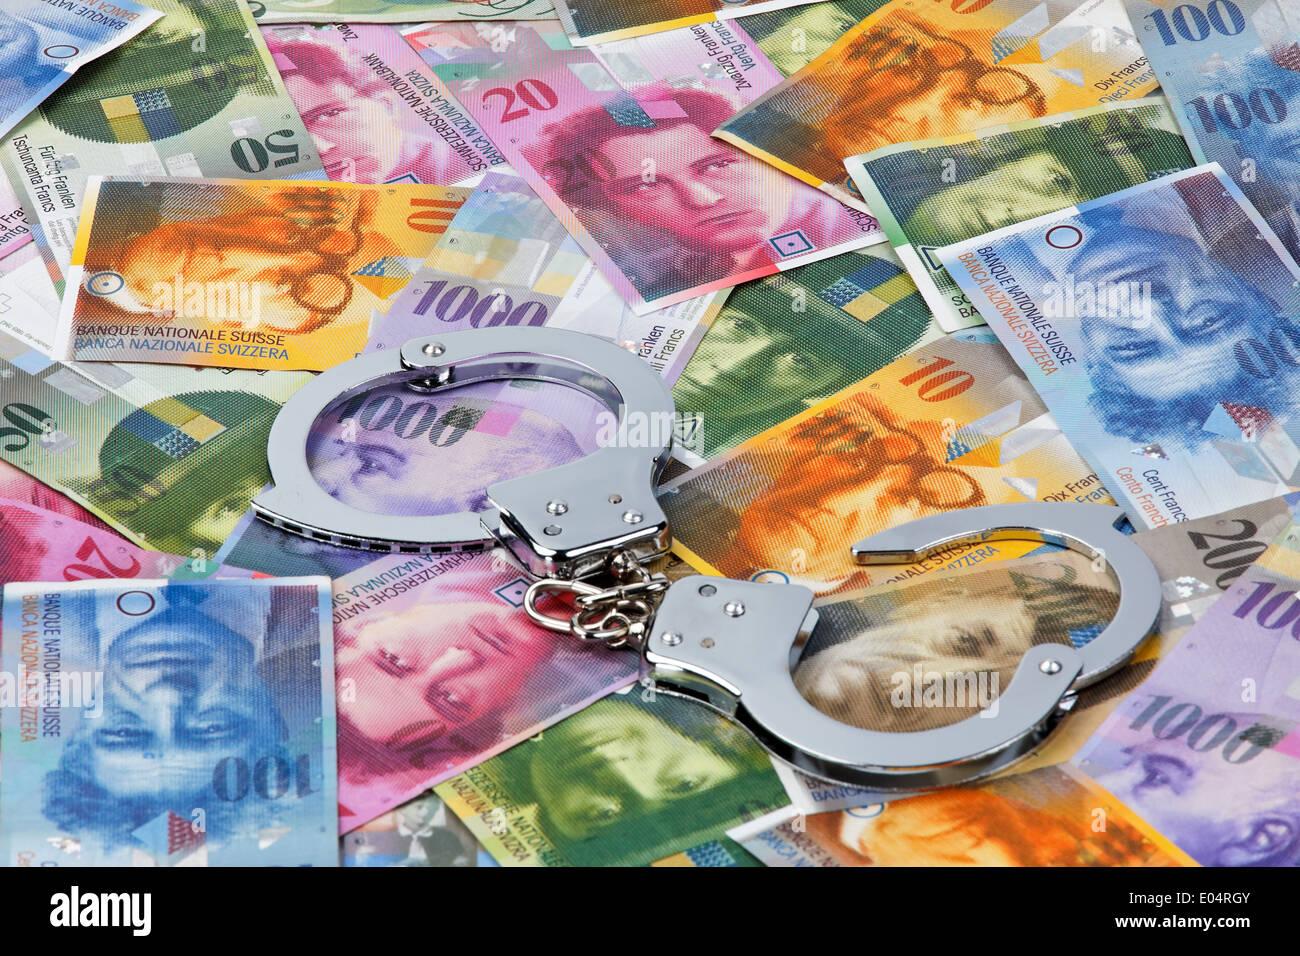 swiss francs money of switzerland with handcuffs schweizer franken stock photo royalty free. Black Bedroom Furniture Sets. Home Design Ideas